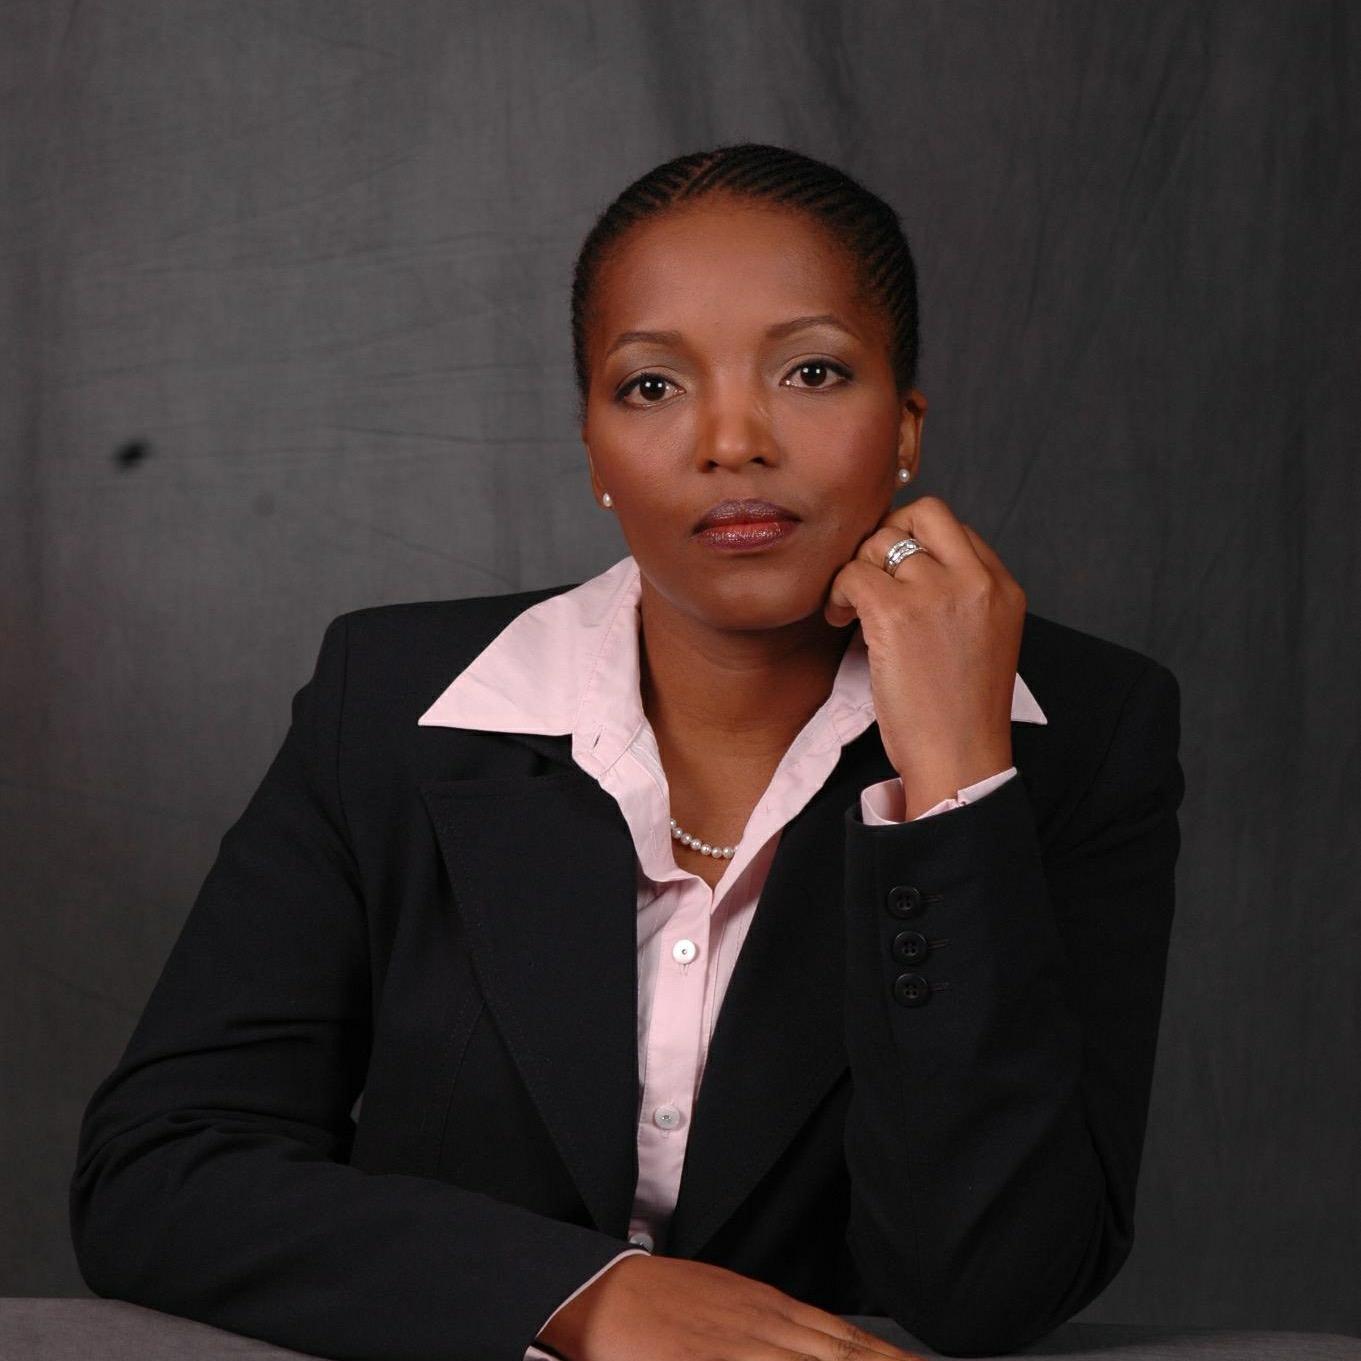 Thandi Profile picture copy 2.png